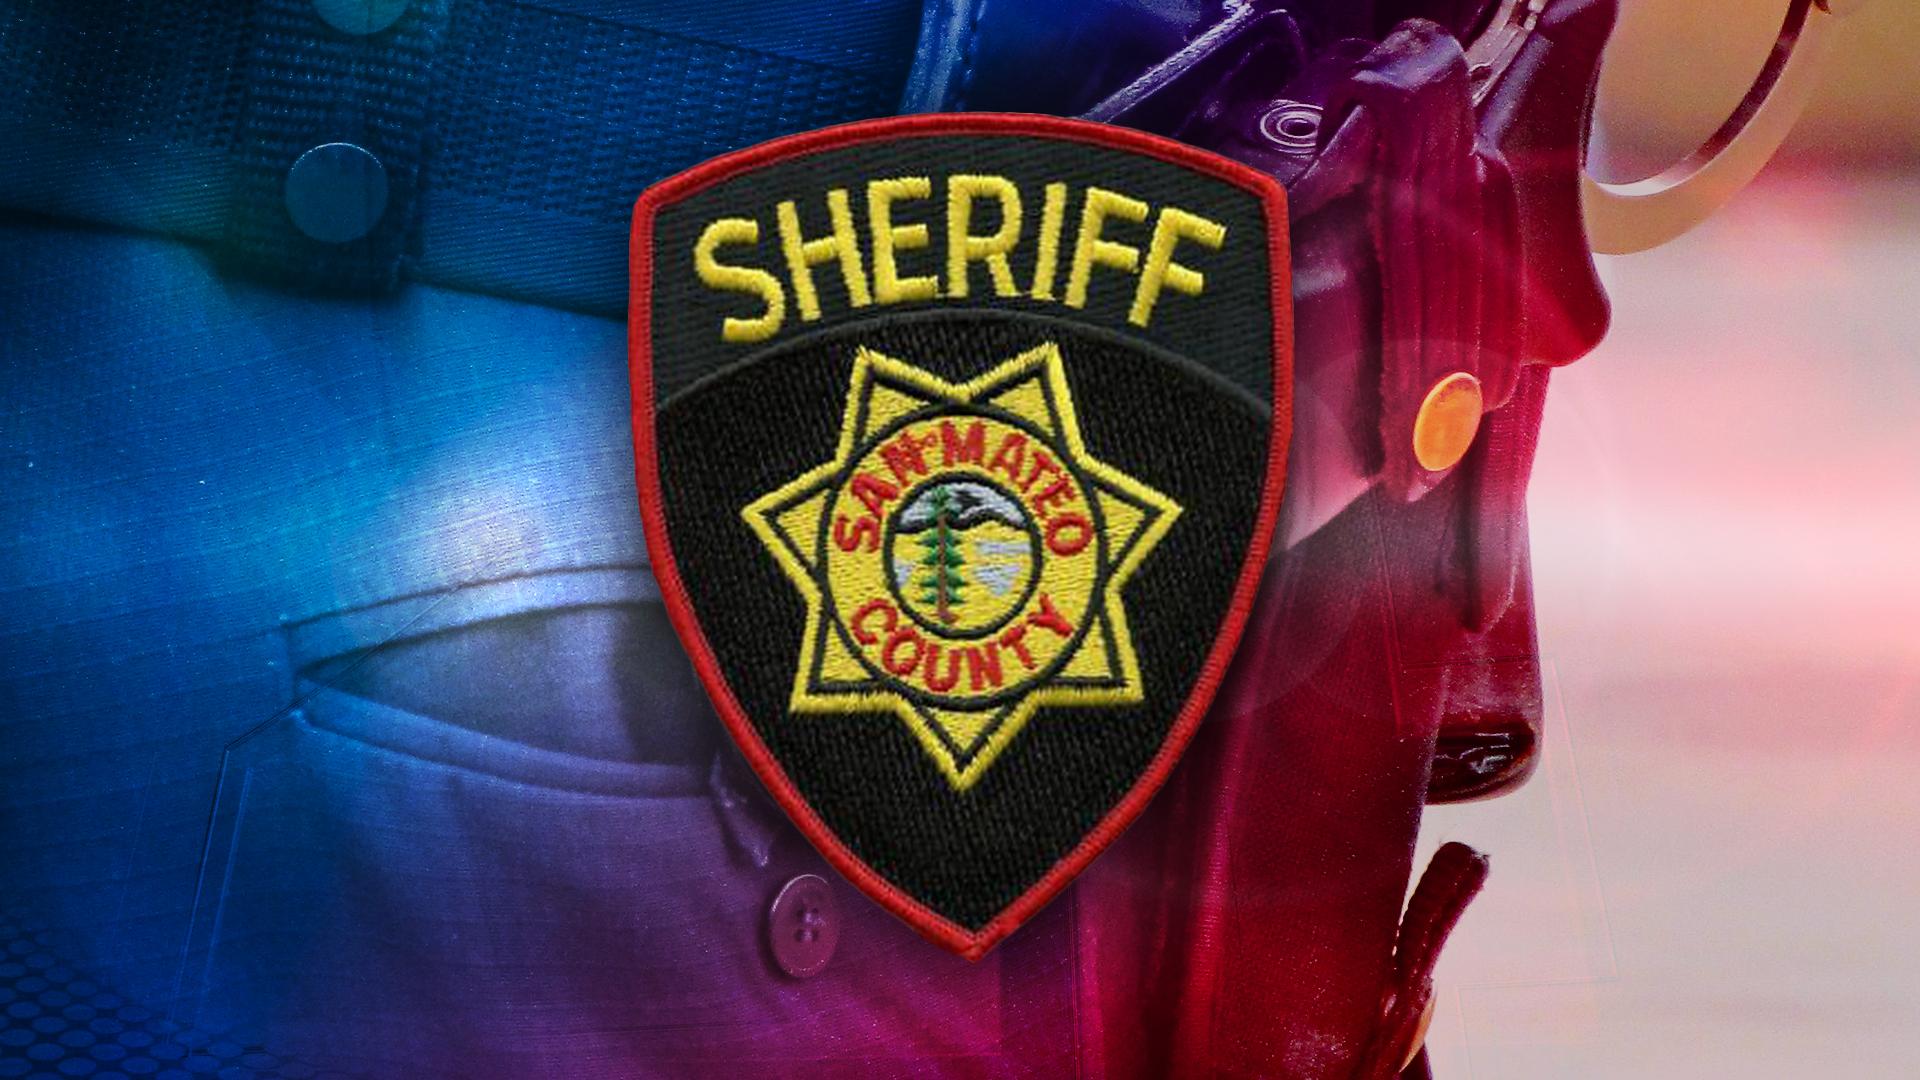 graphic FS Sheriff San Mateo county_1523153163974.jpg.jpg